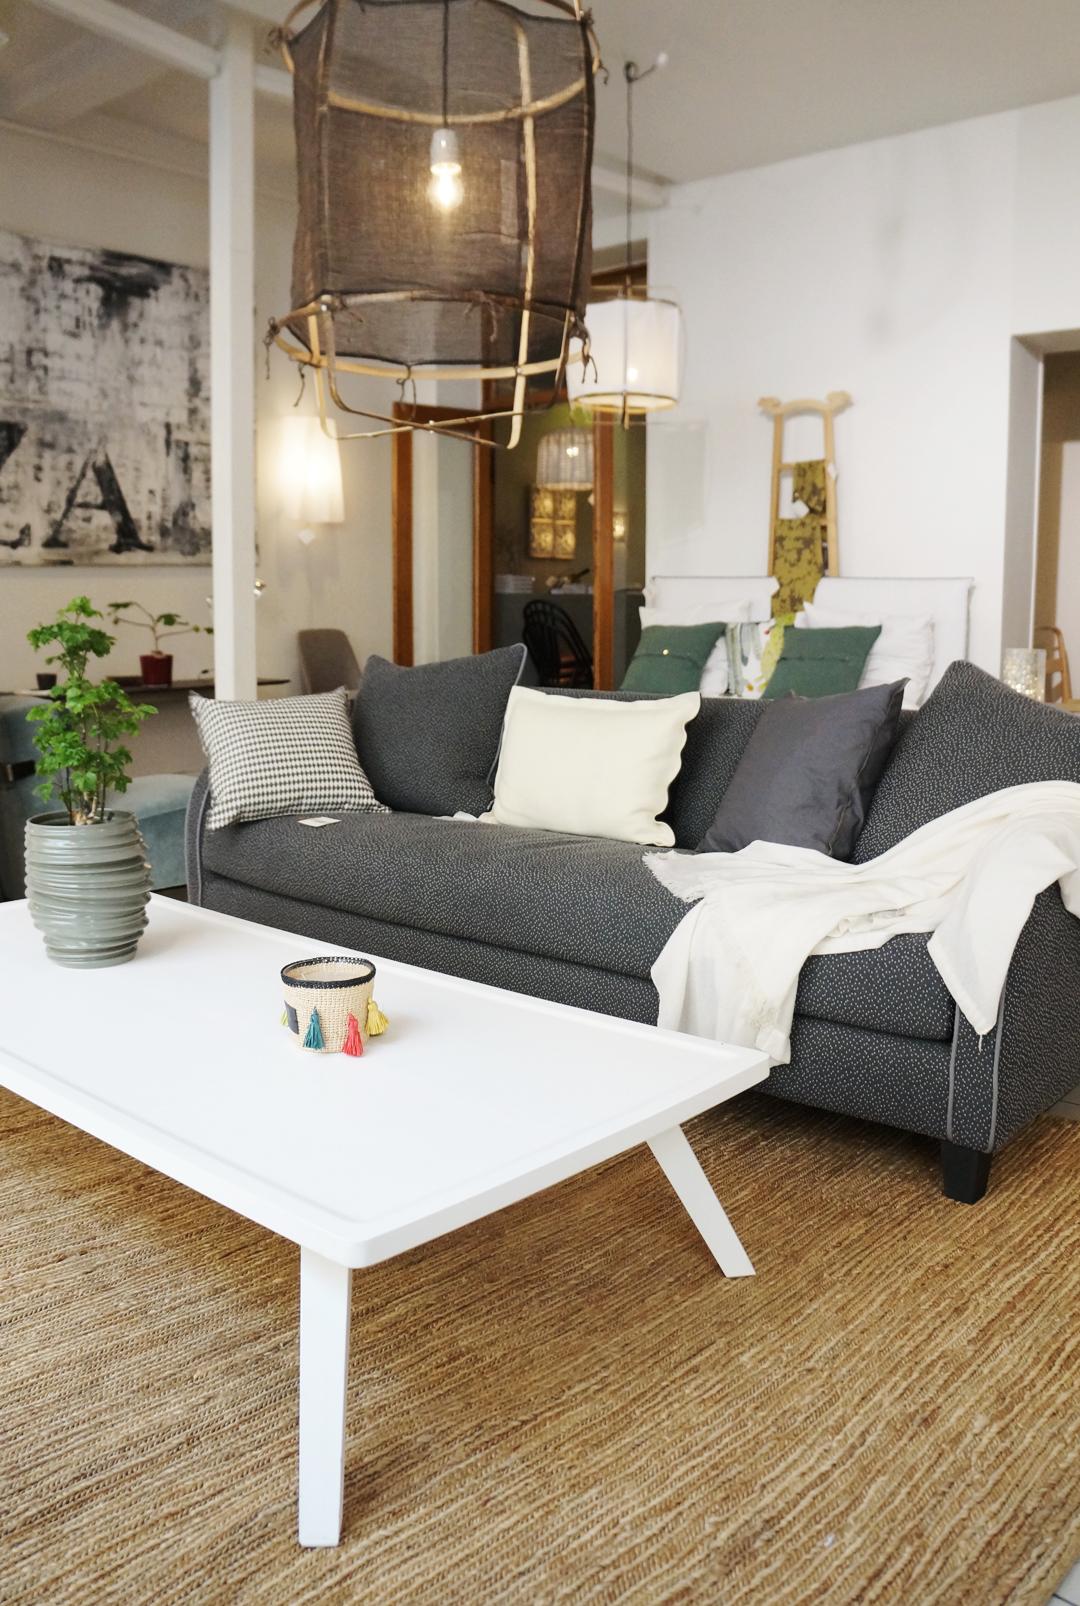 Next Sofa Designed By Paola Navone . . . #casuarina #casuarinastore  #casuarinacollection #